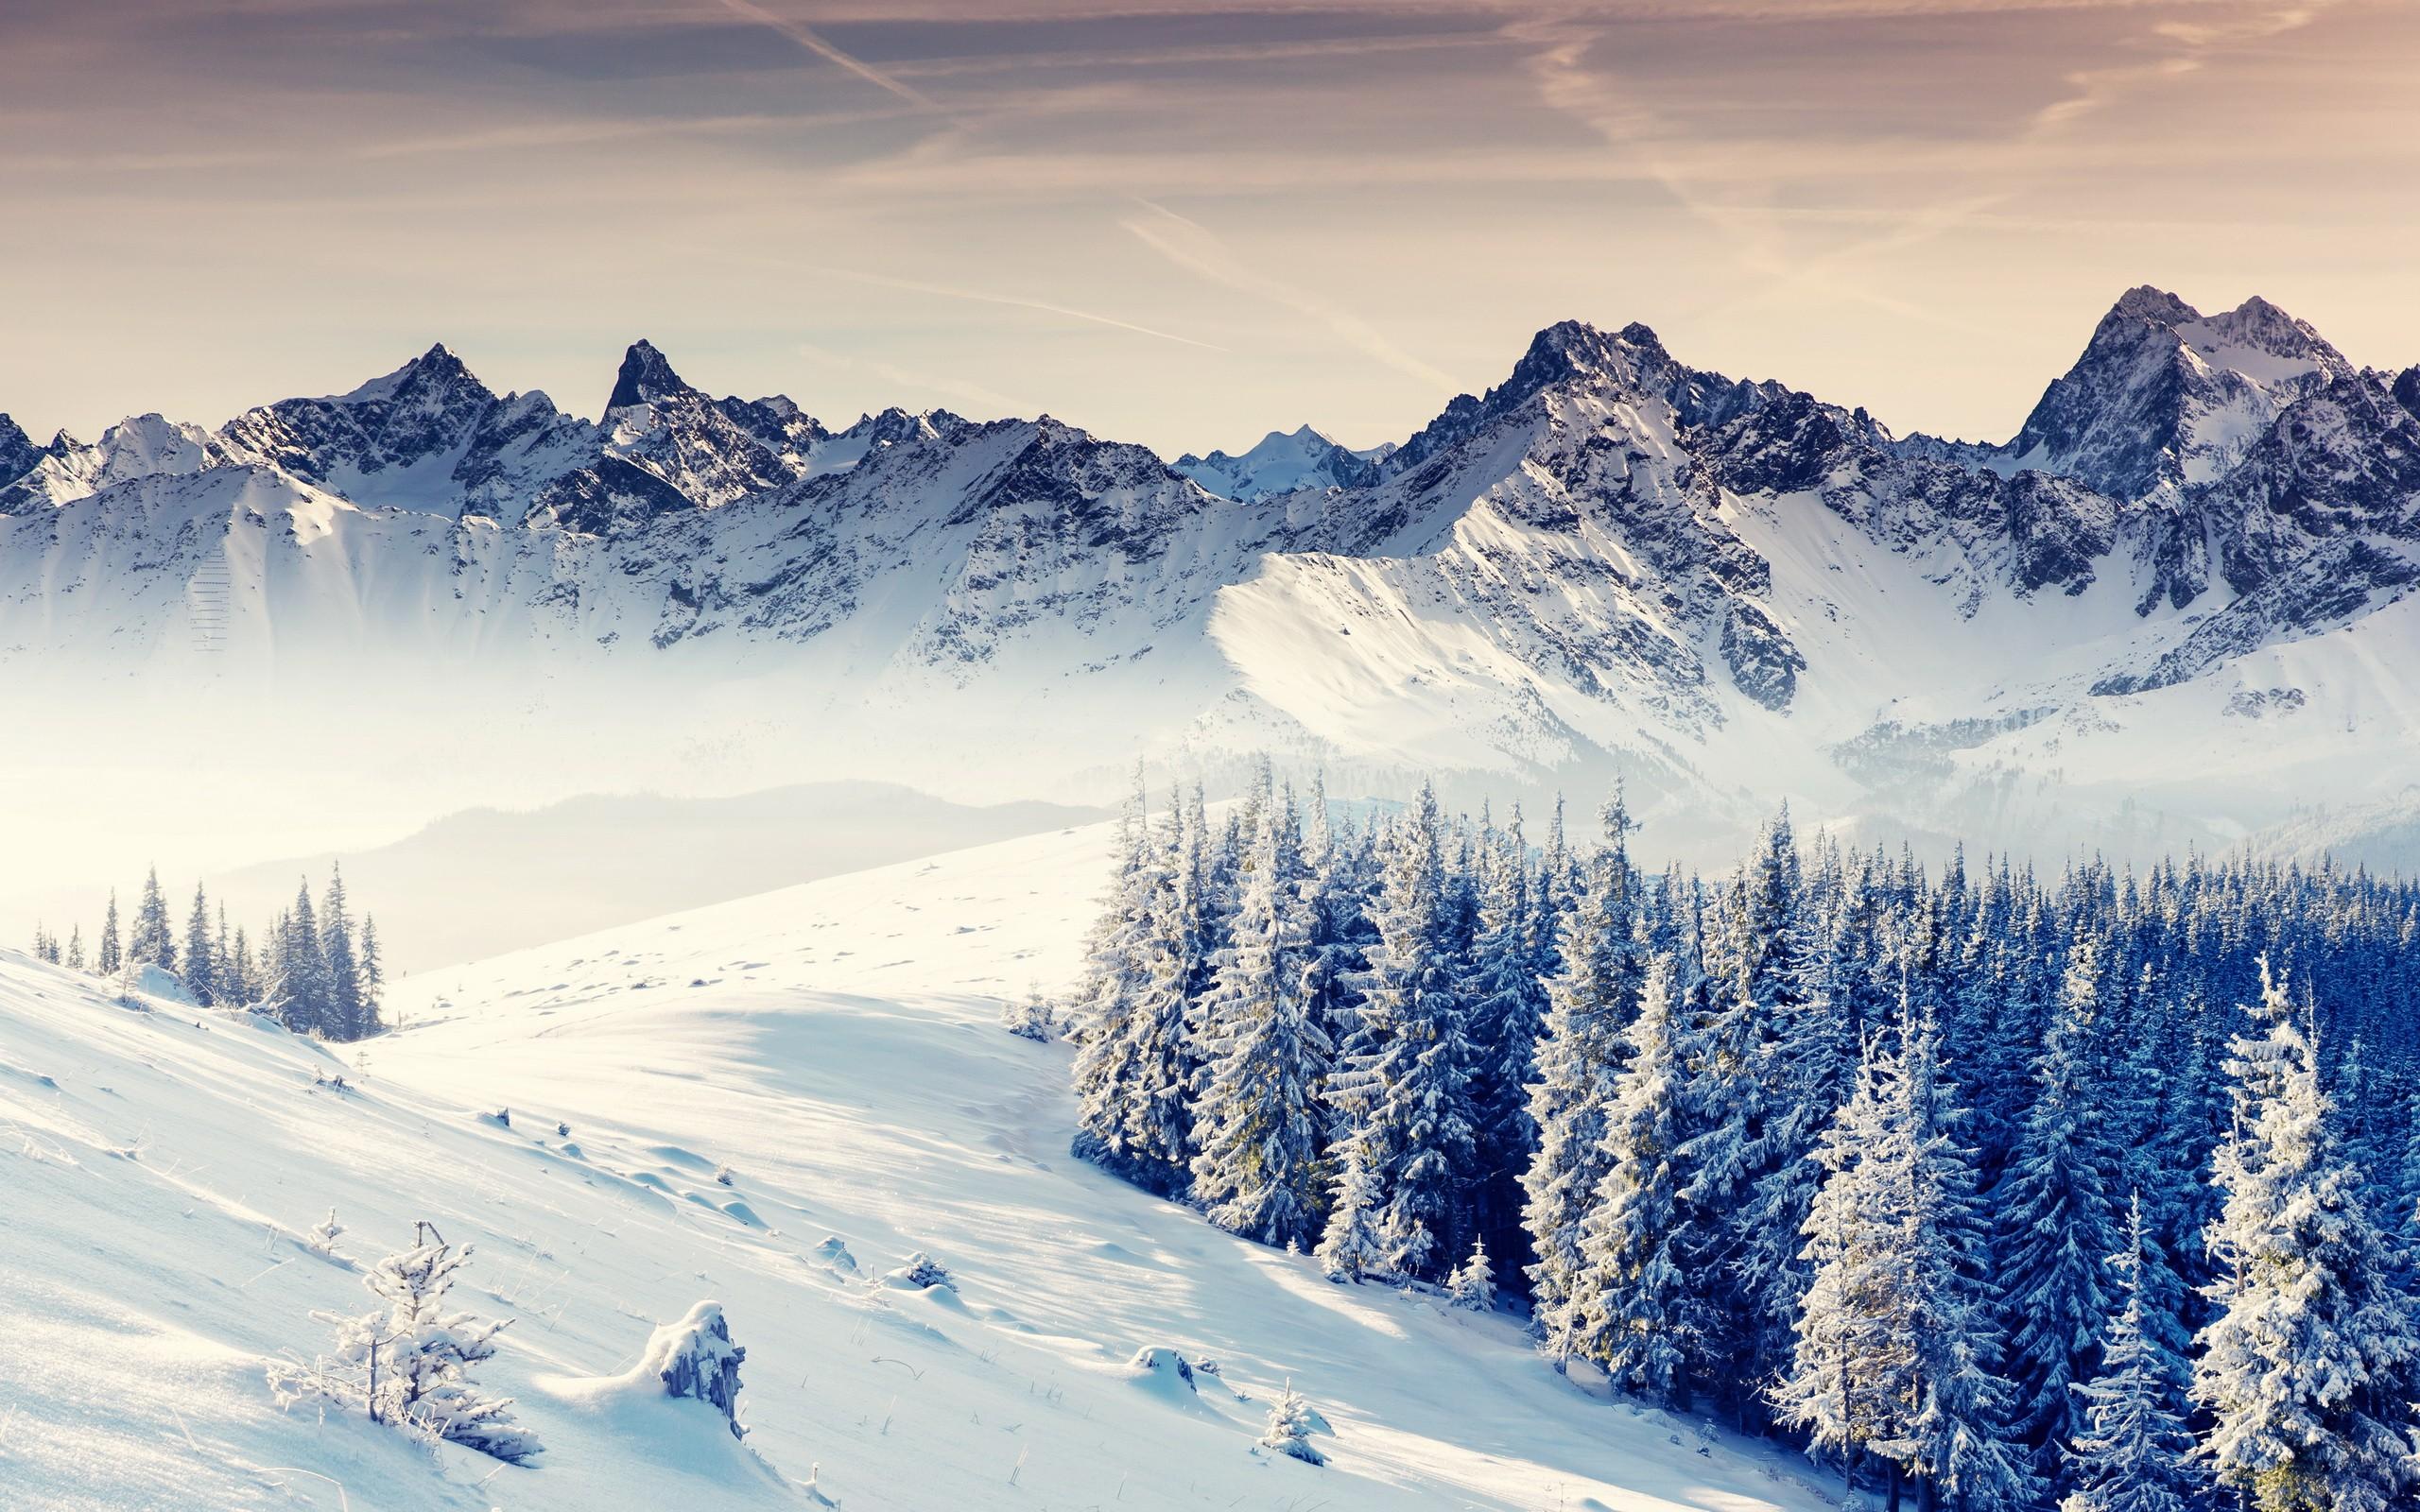 General 2560x1600 nature winter mountains landscape snow